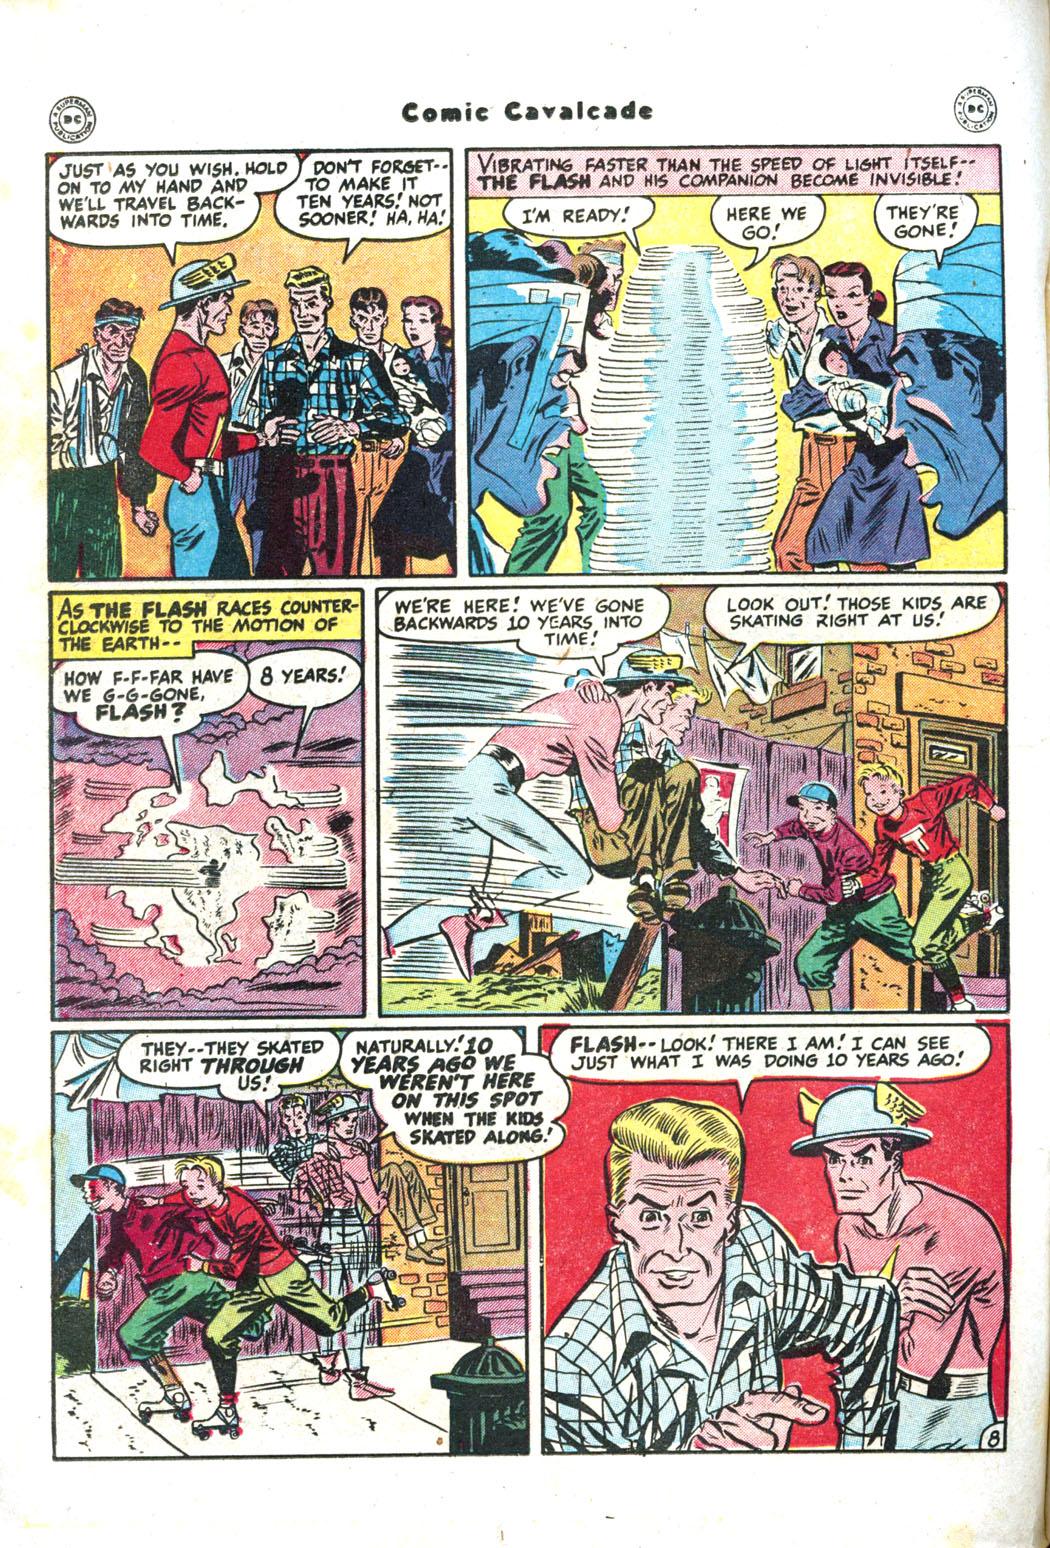 Comic Cavalcade issue 26 - Page 68